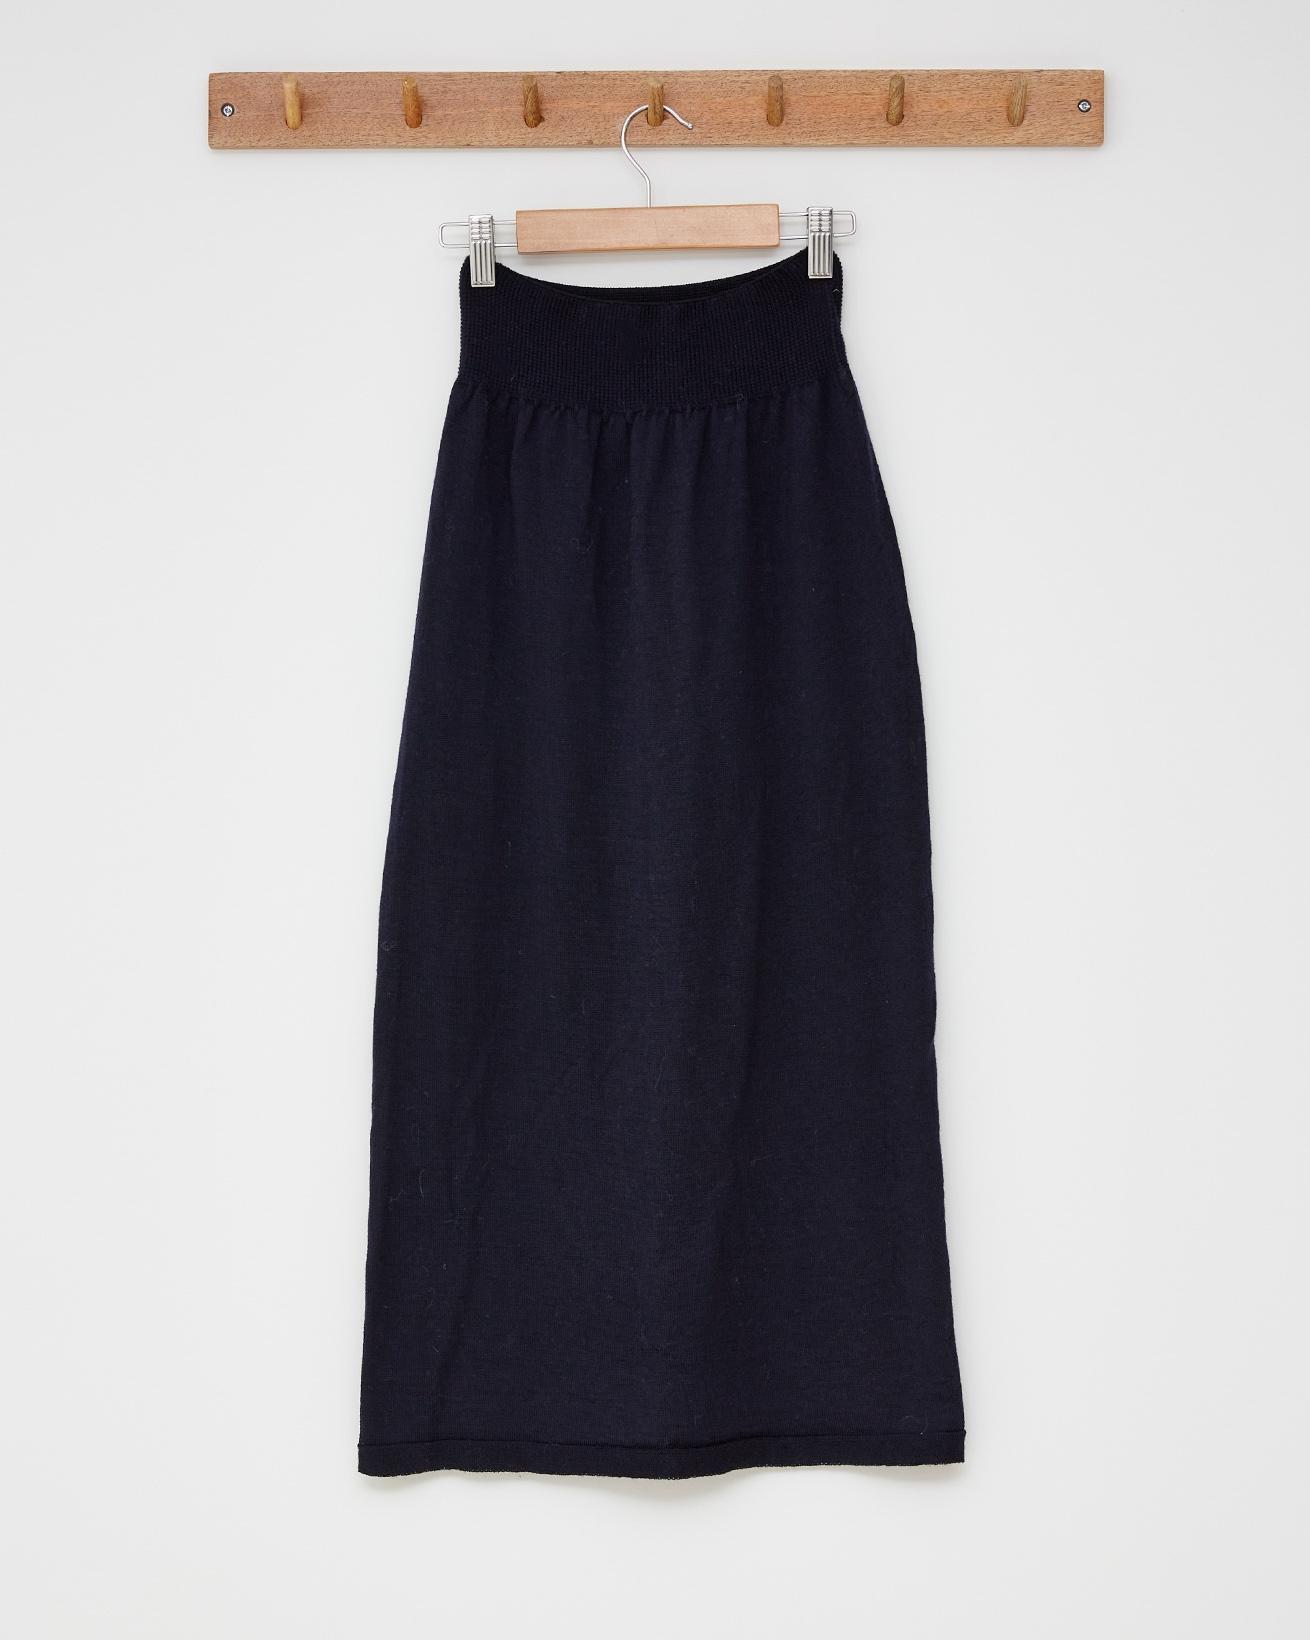 Ladies merino skirt - with back leg slit - Size Small - Navy - 2525